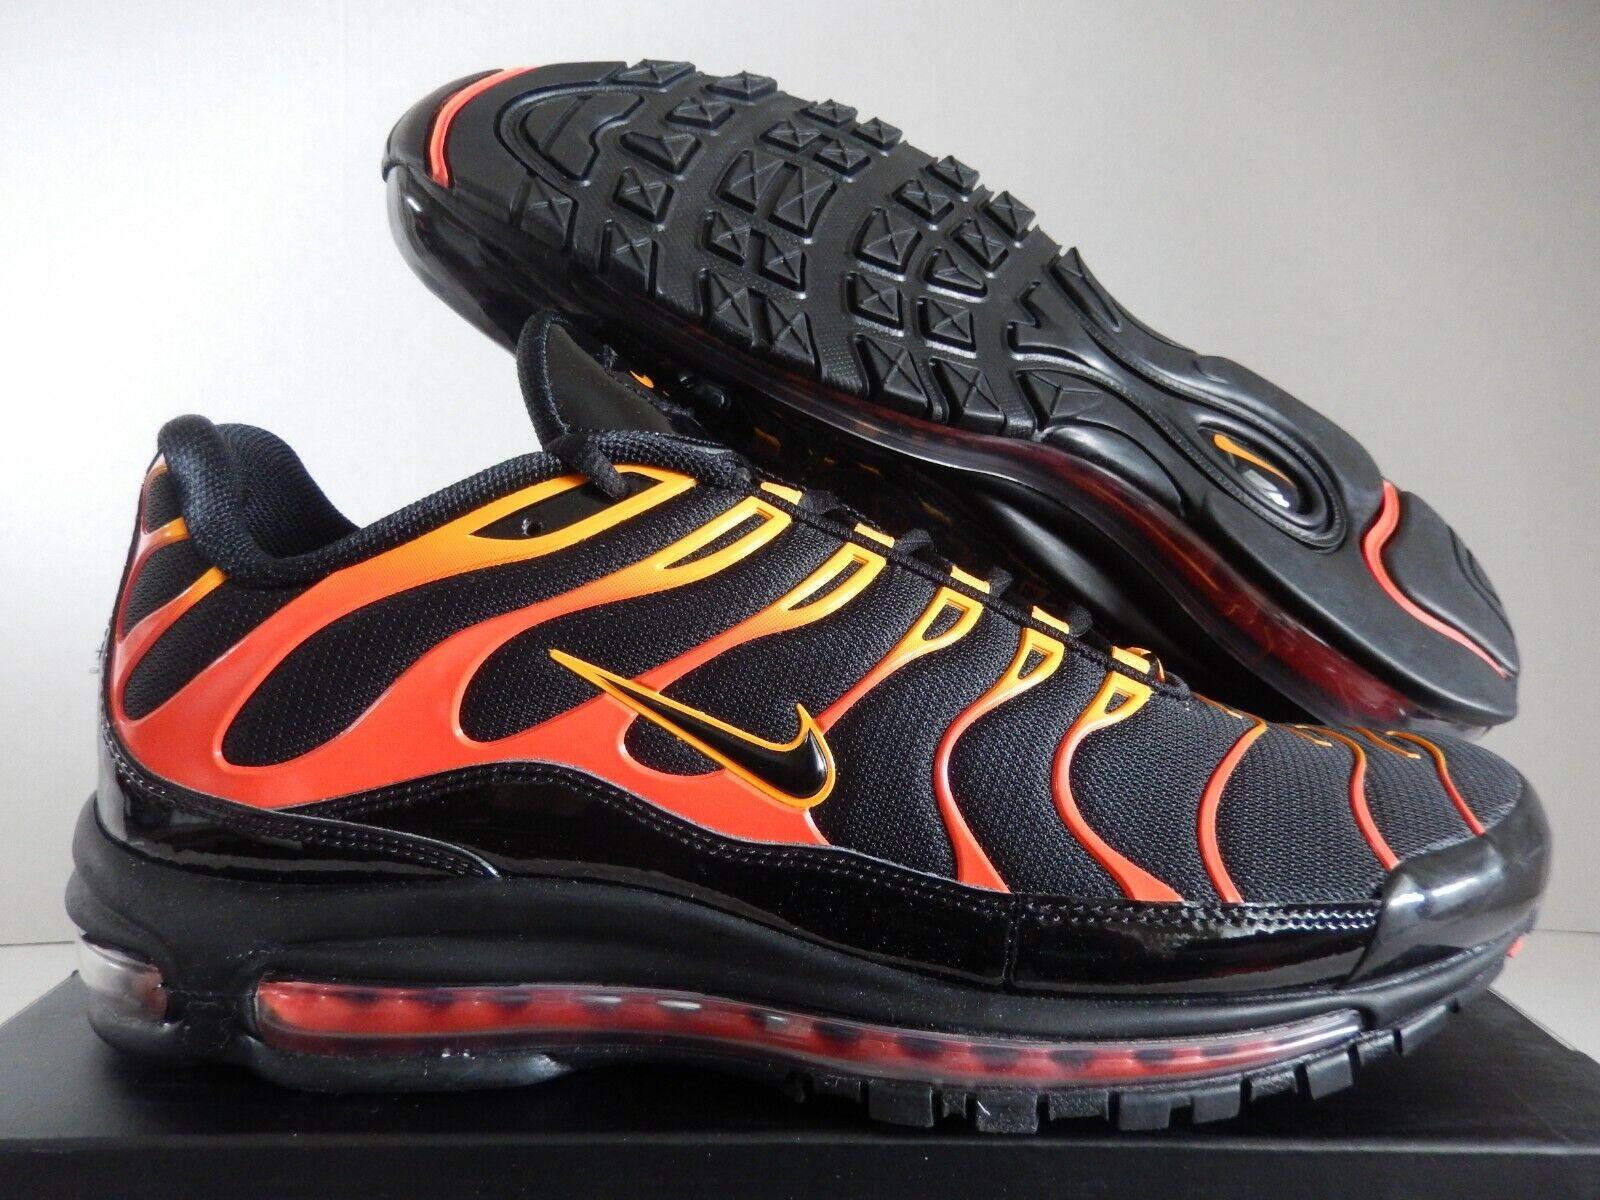 d15646a70d Nike Air Max 97 / Plus Shock Orange Black Engine Ah8144 002 US Mens ...